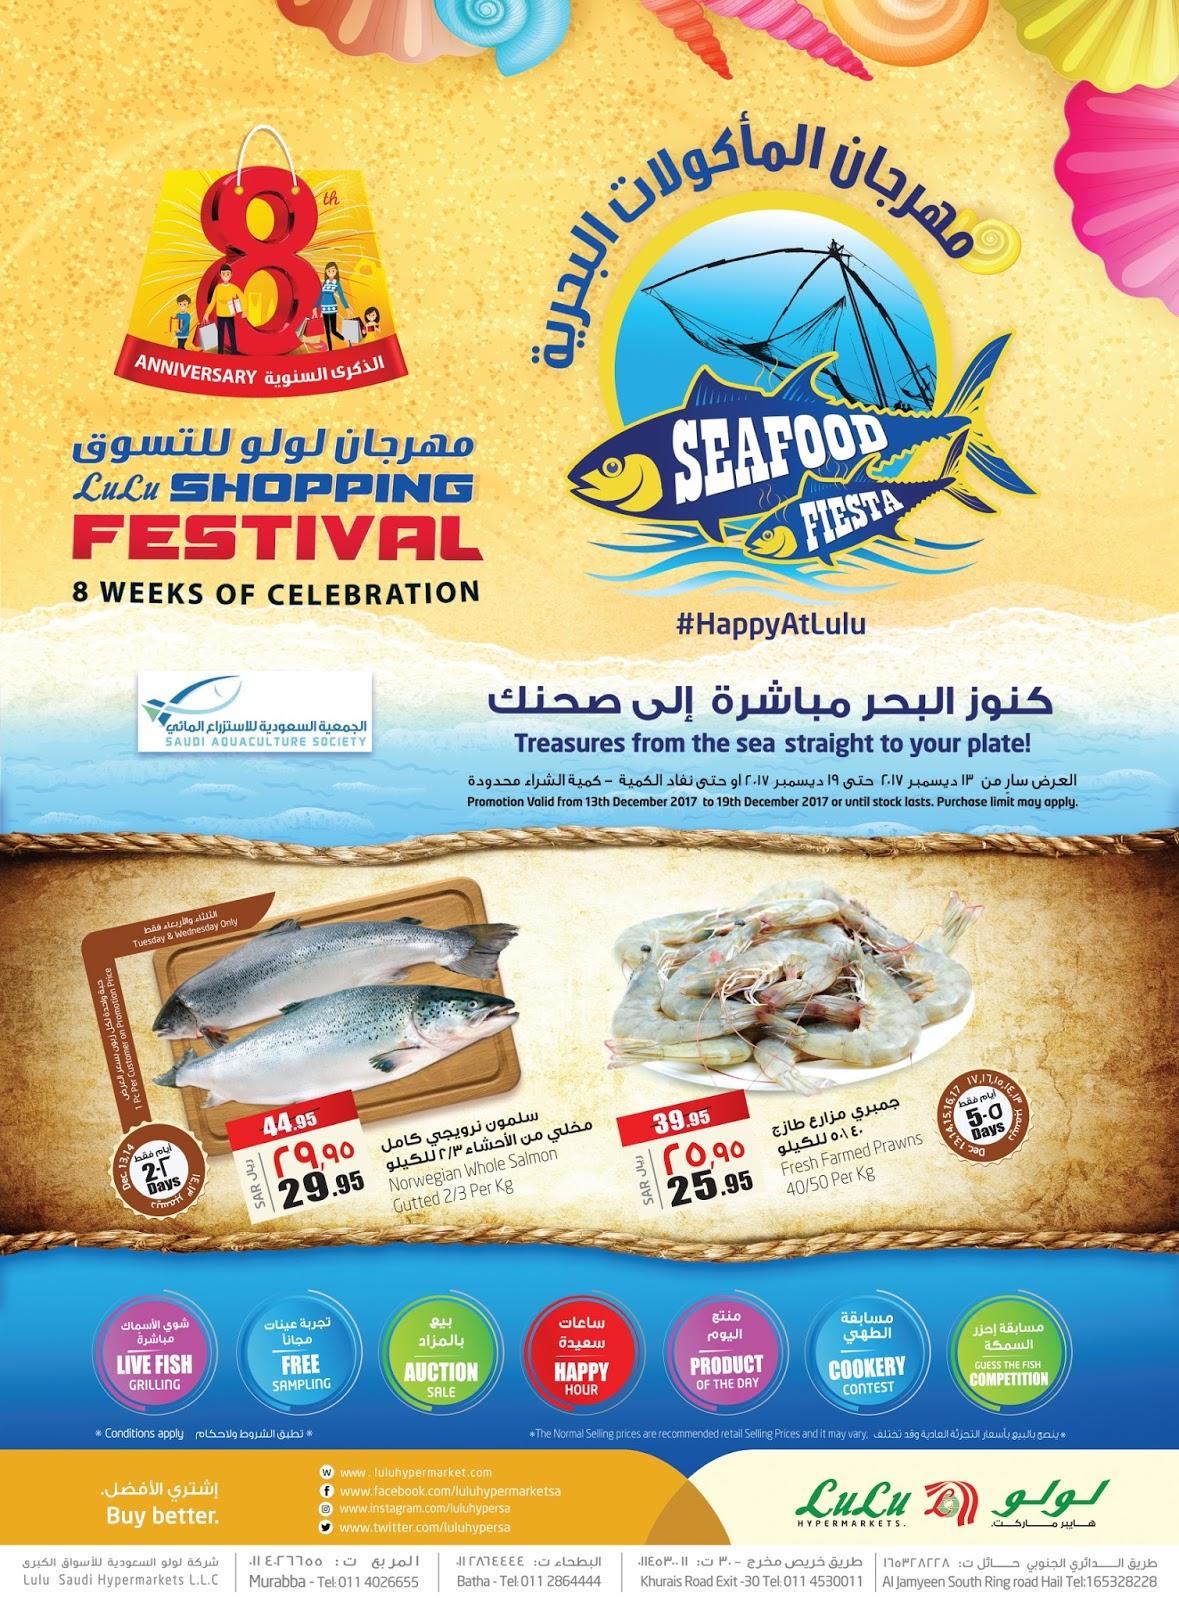 Hypermart Voucher 20000003 Daftar Harga Terkini Terlengkap Di Agung 50000 Bth Lulu Hypermarket Seafood Fiesta Promo Offers December 13